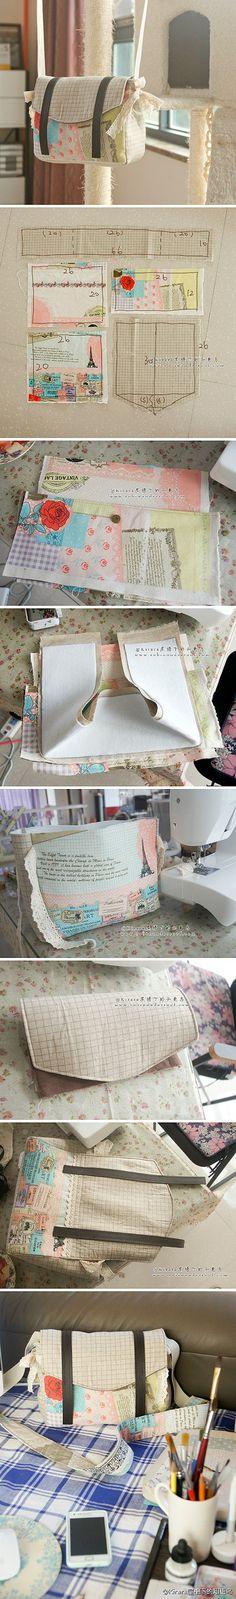 DIY patchwork bag sewing pattern